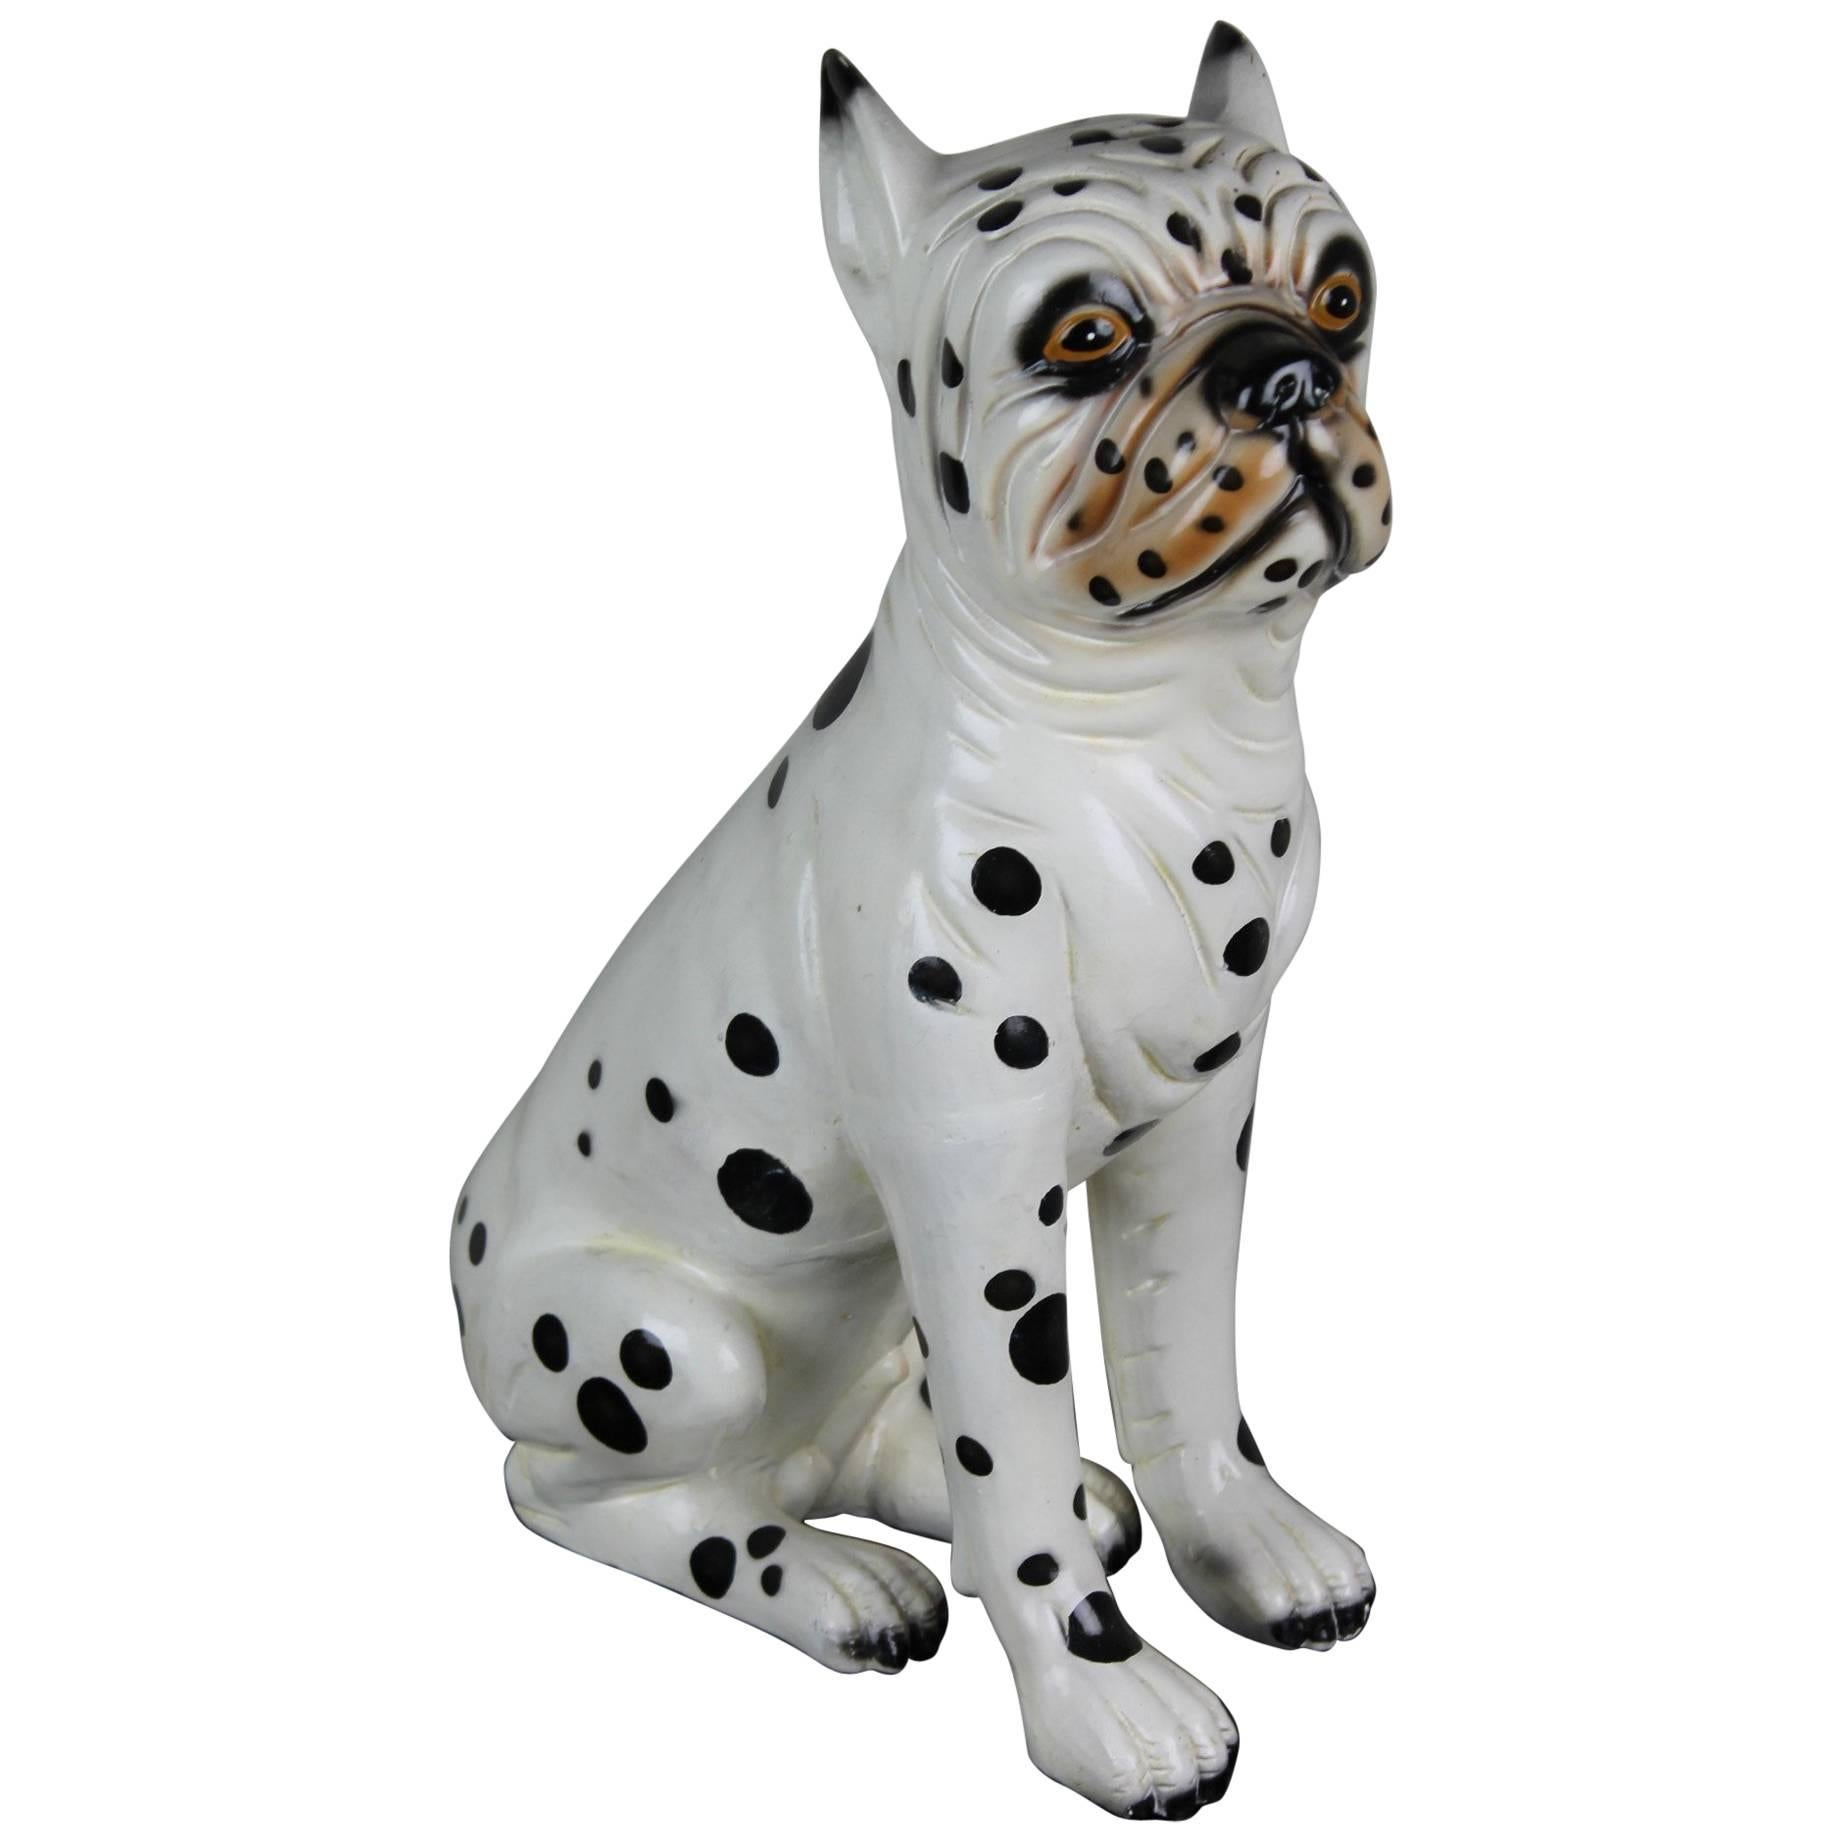 Hand-Painted Ceramic Dog Sculpture, Dalmatian Bulldog, 1960s